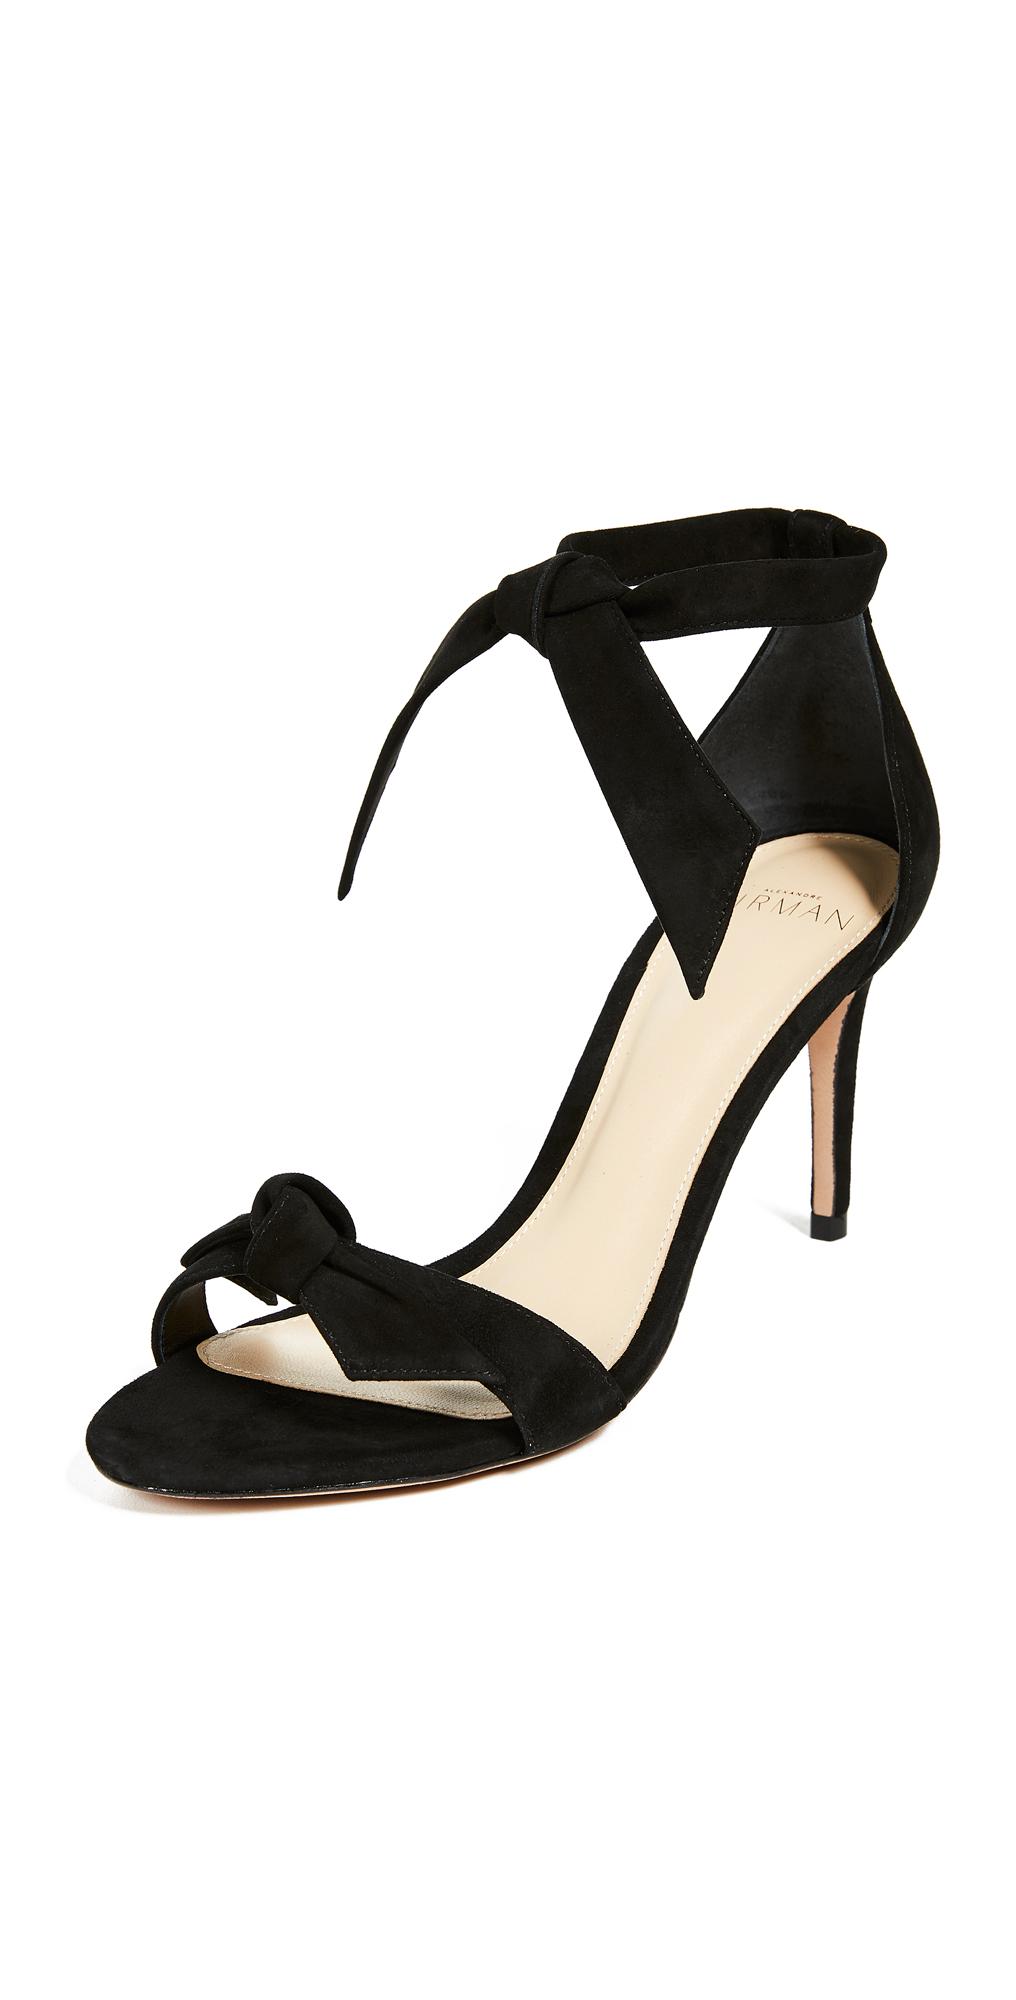 Alexandre Birman Clarita 75mm Sandals